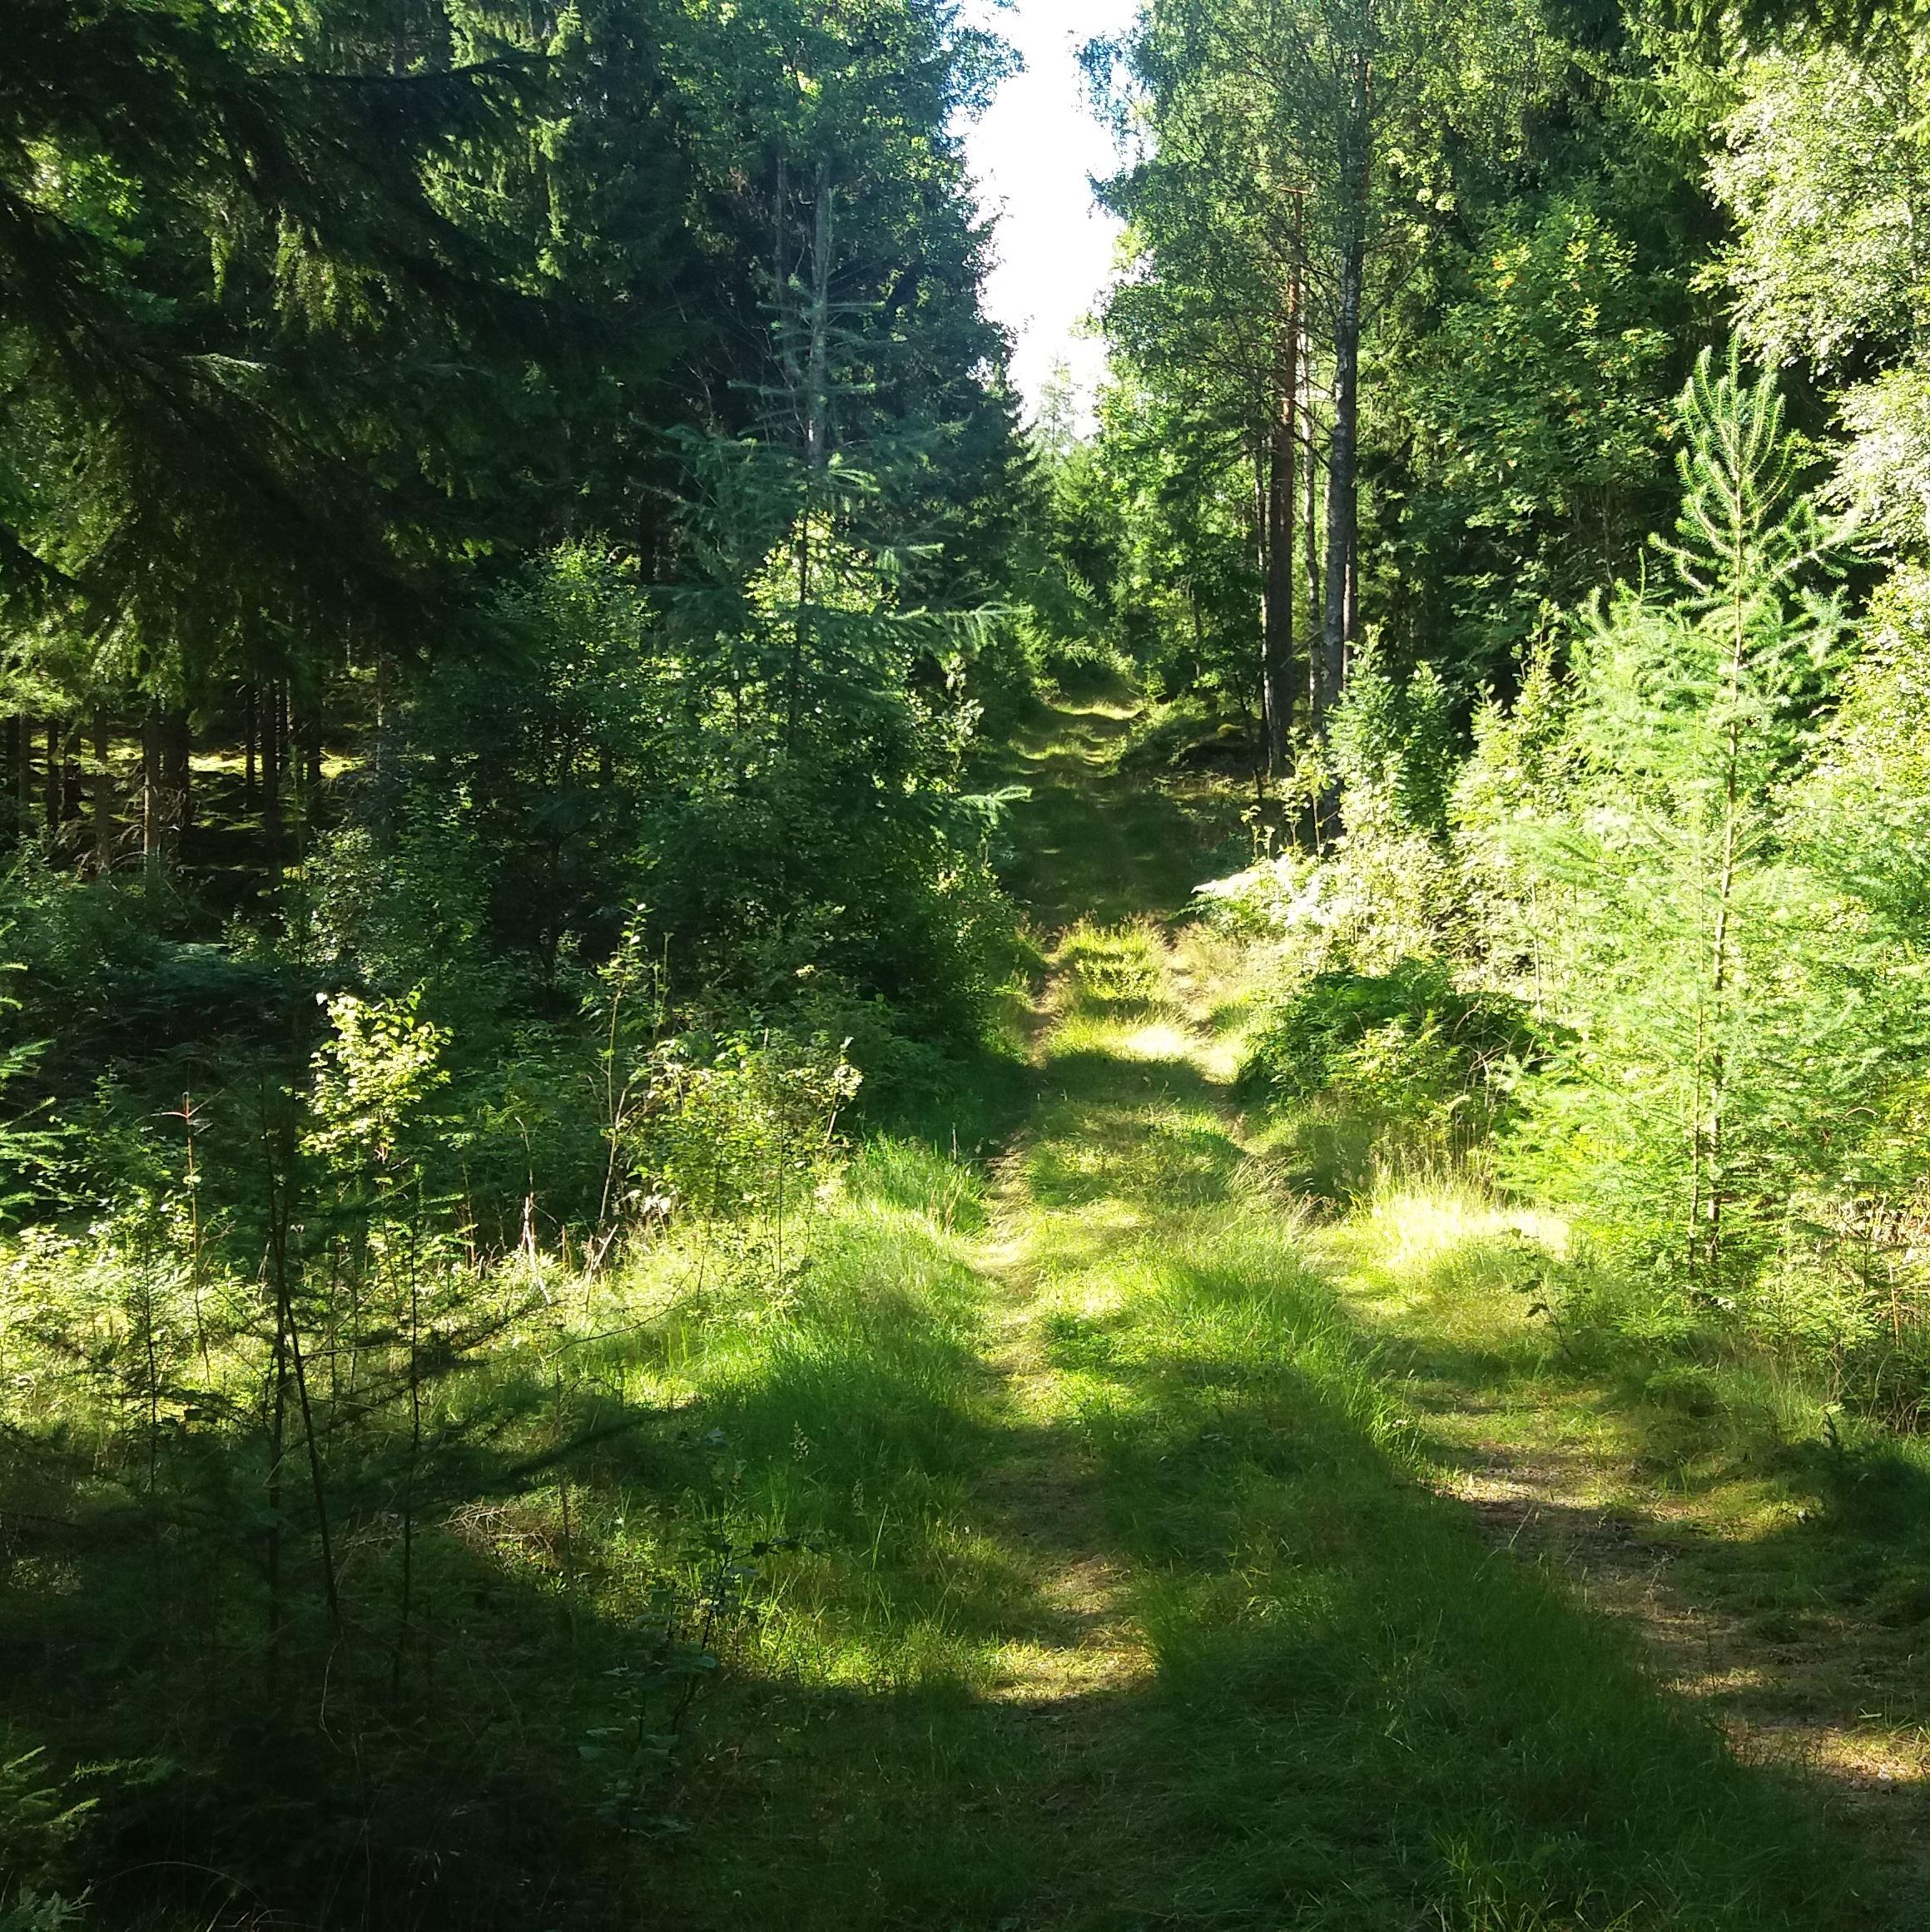 Cykelrundtur (MTB) Jonstorp-Kylen (34 km)